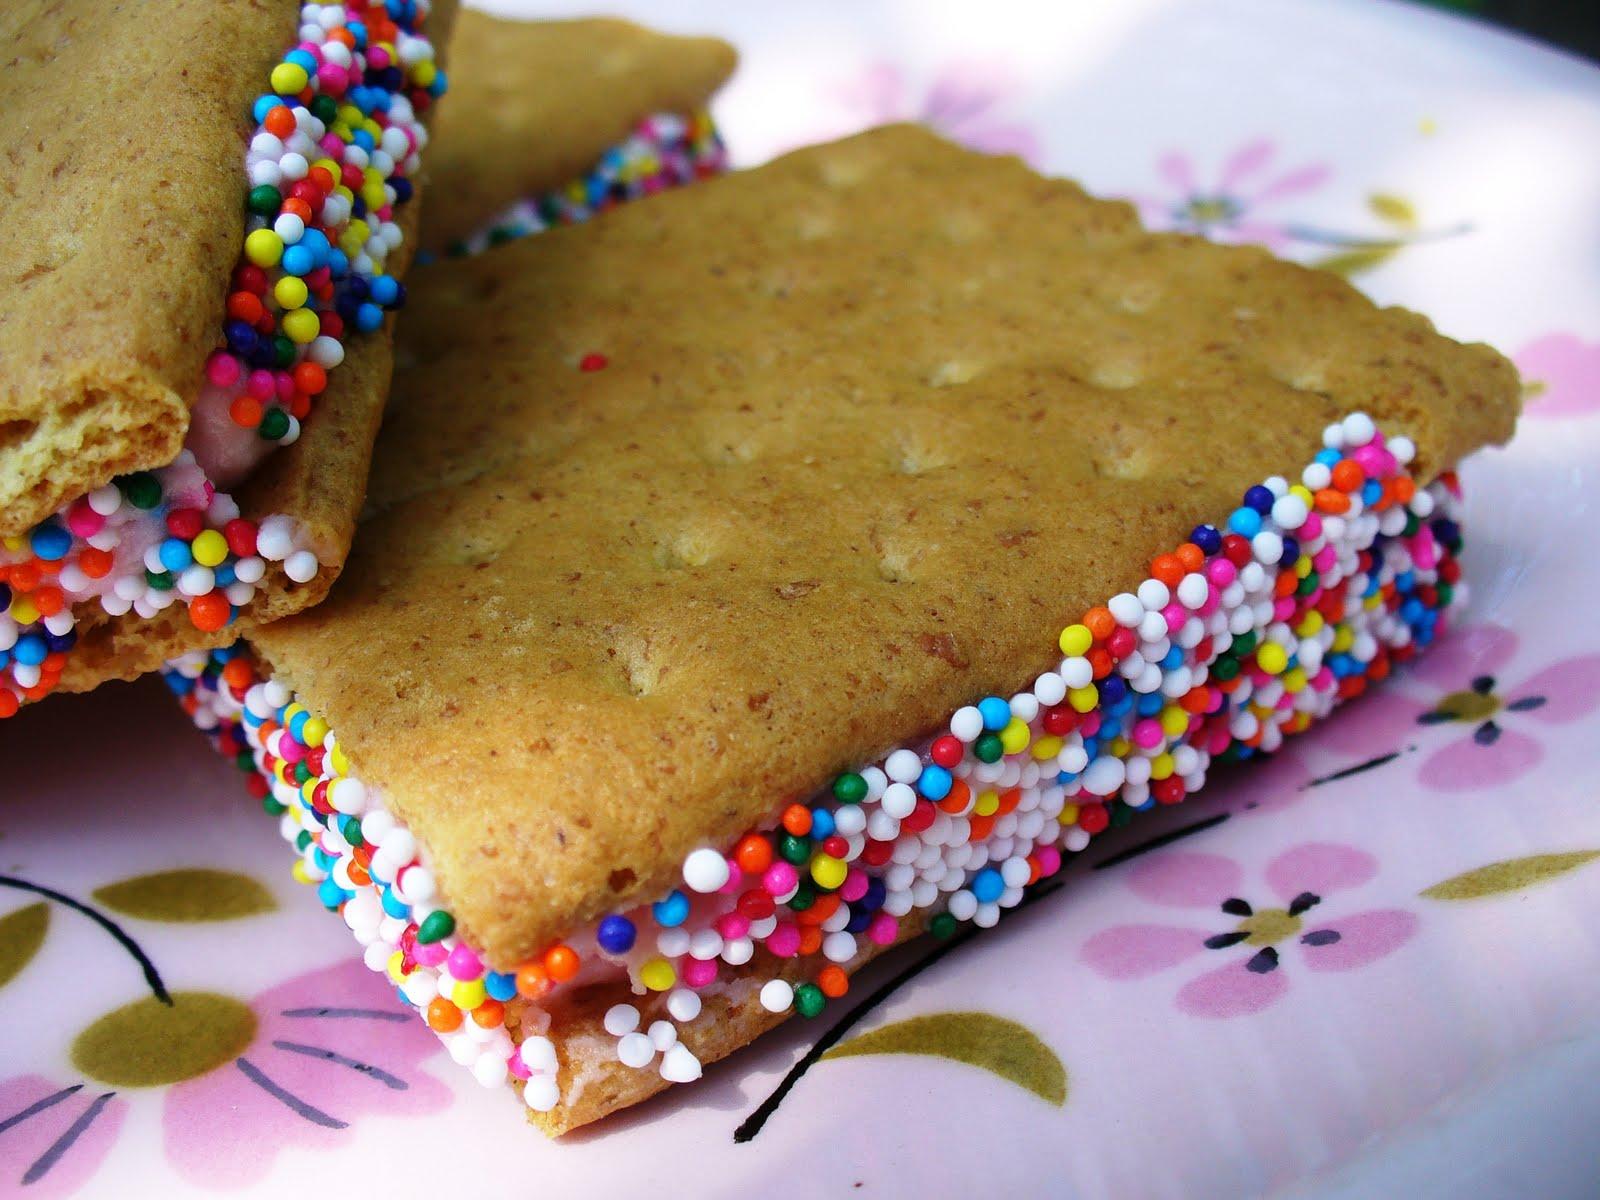 Leenee's Sweetest Delights: A Summer Treat